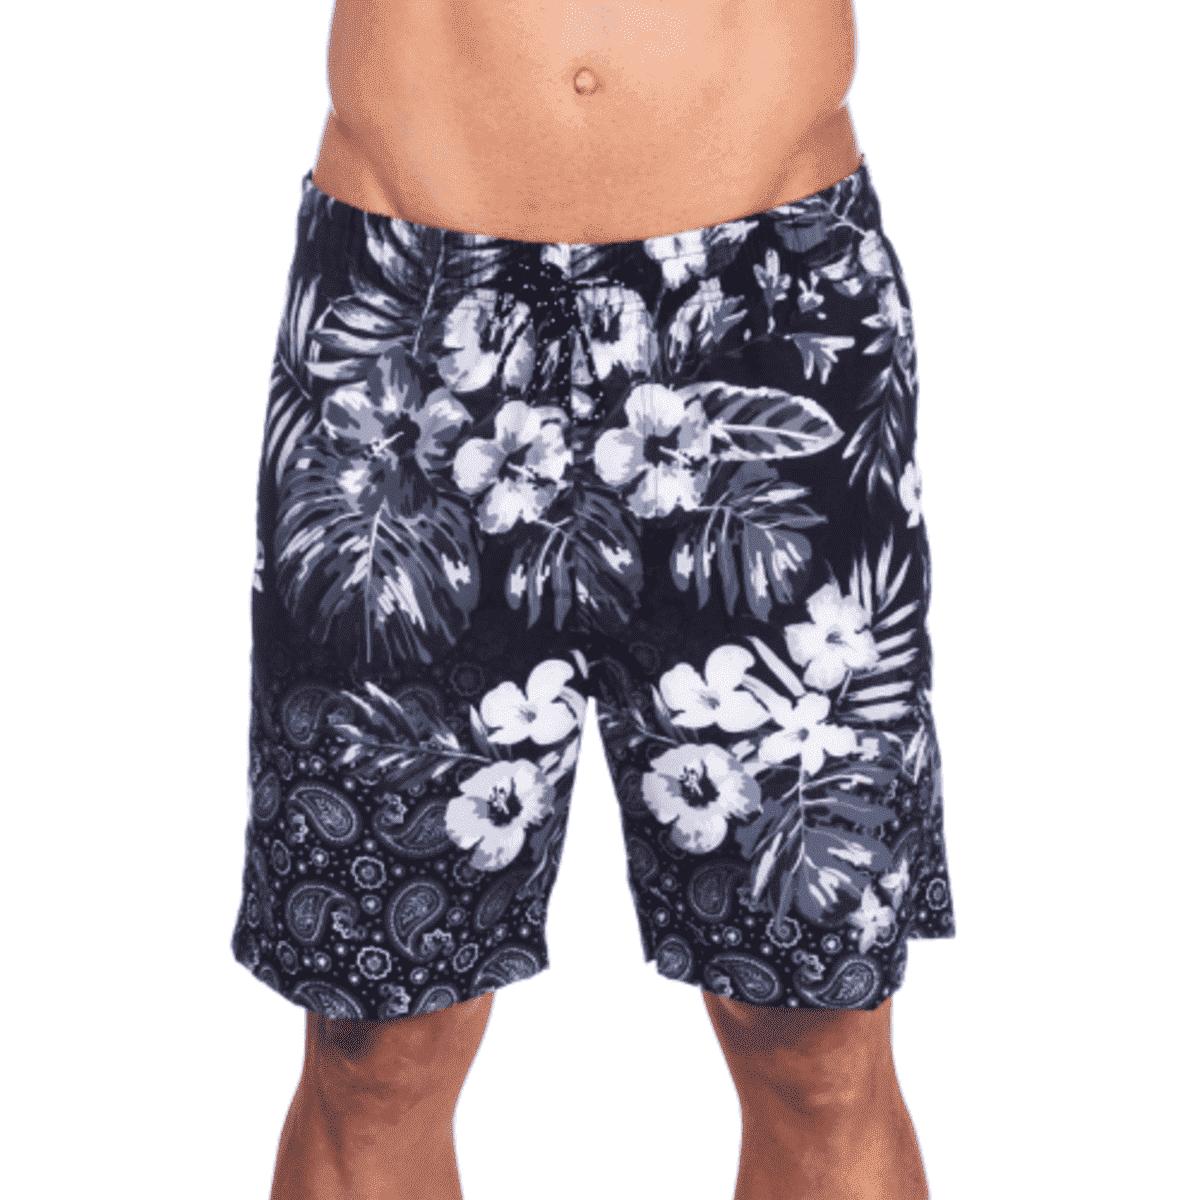 Kit 10 Short Bermuda Moletom Masculina Florida Floral Atacado